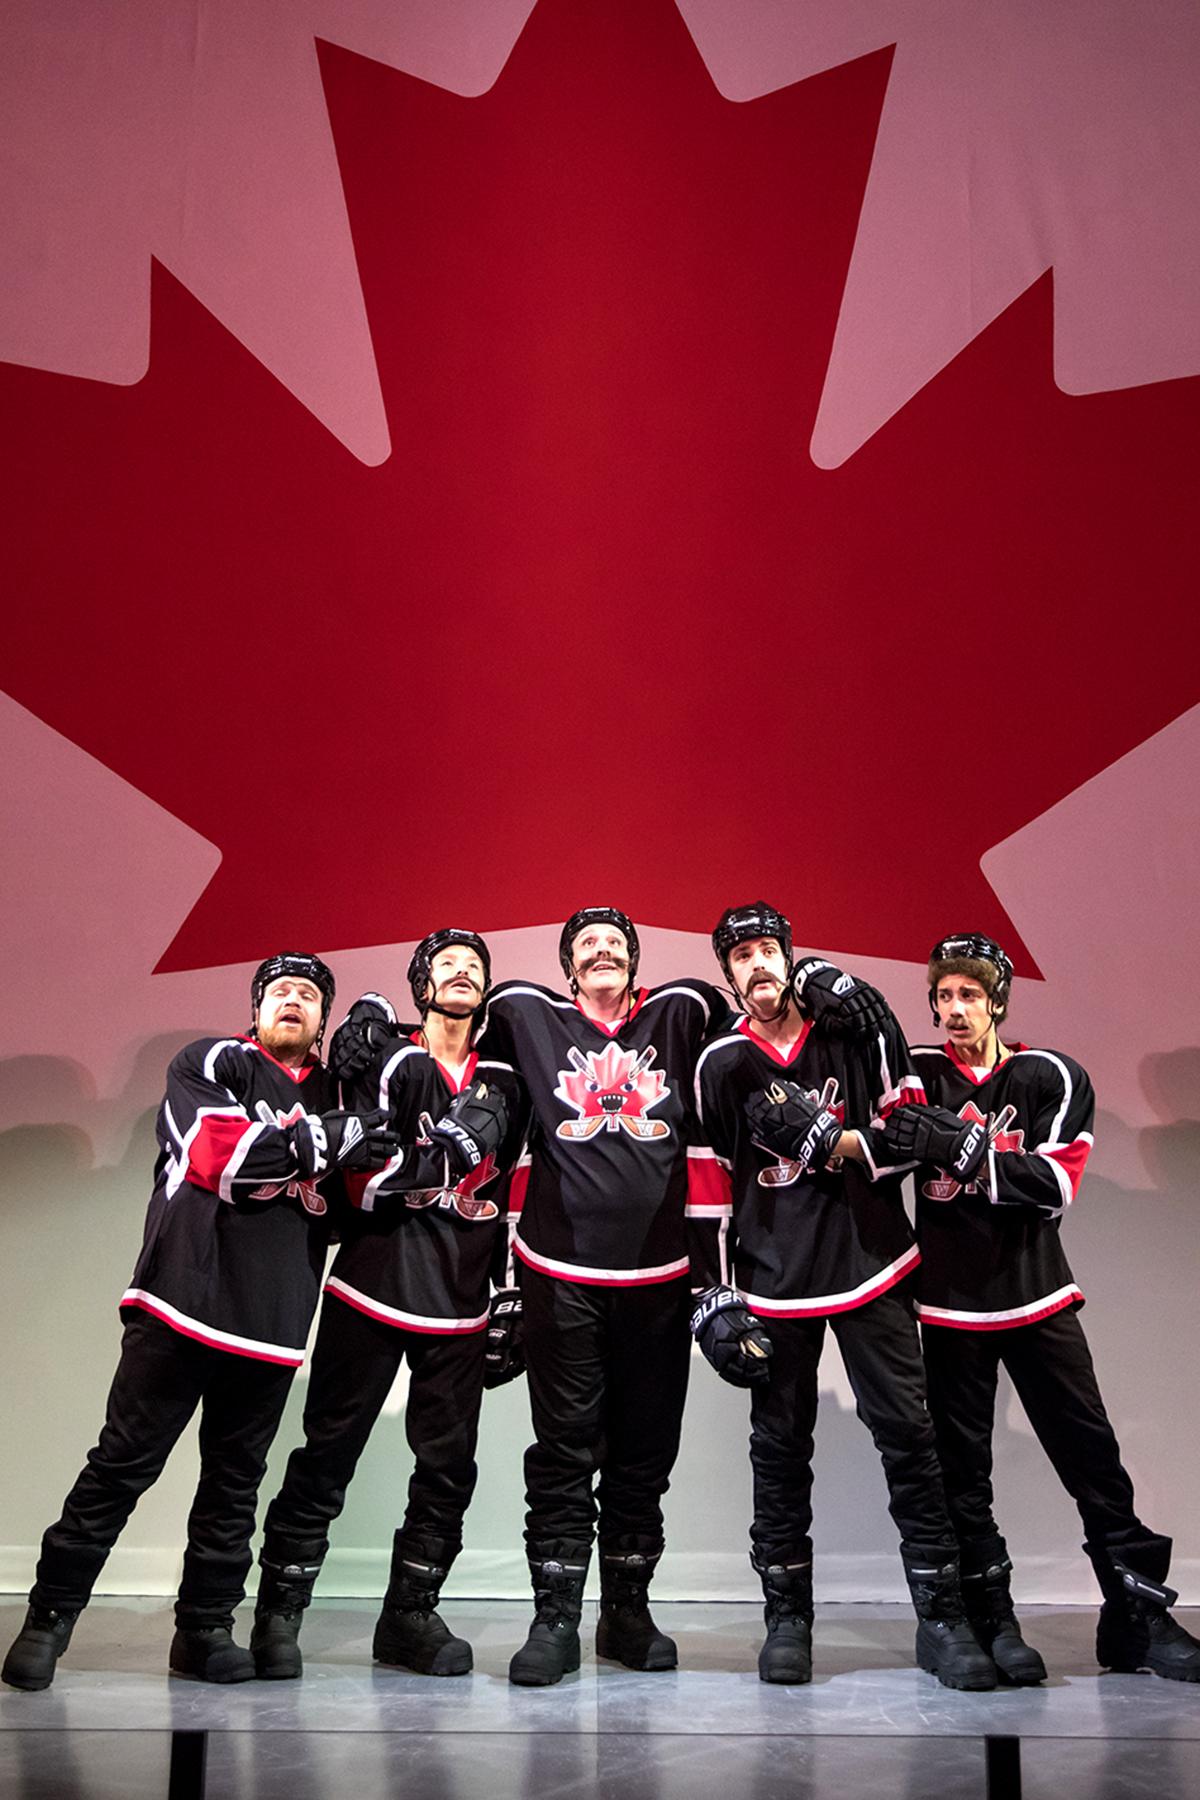 Canadian 'youth' hockey players photo by Dan Norman.jpg